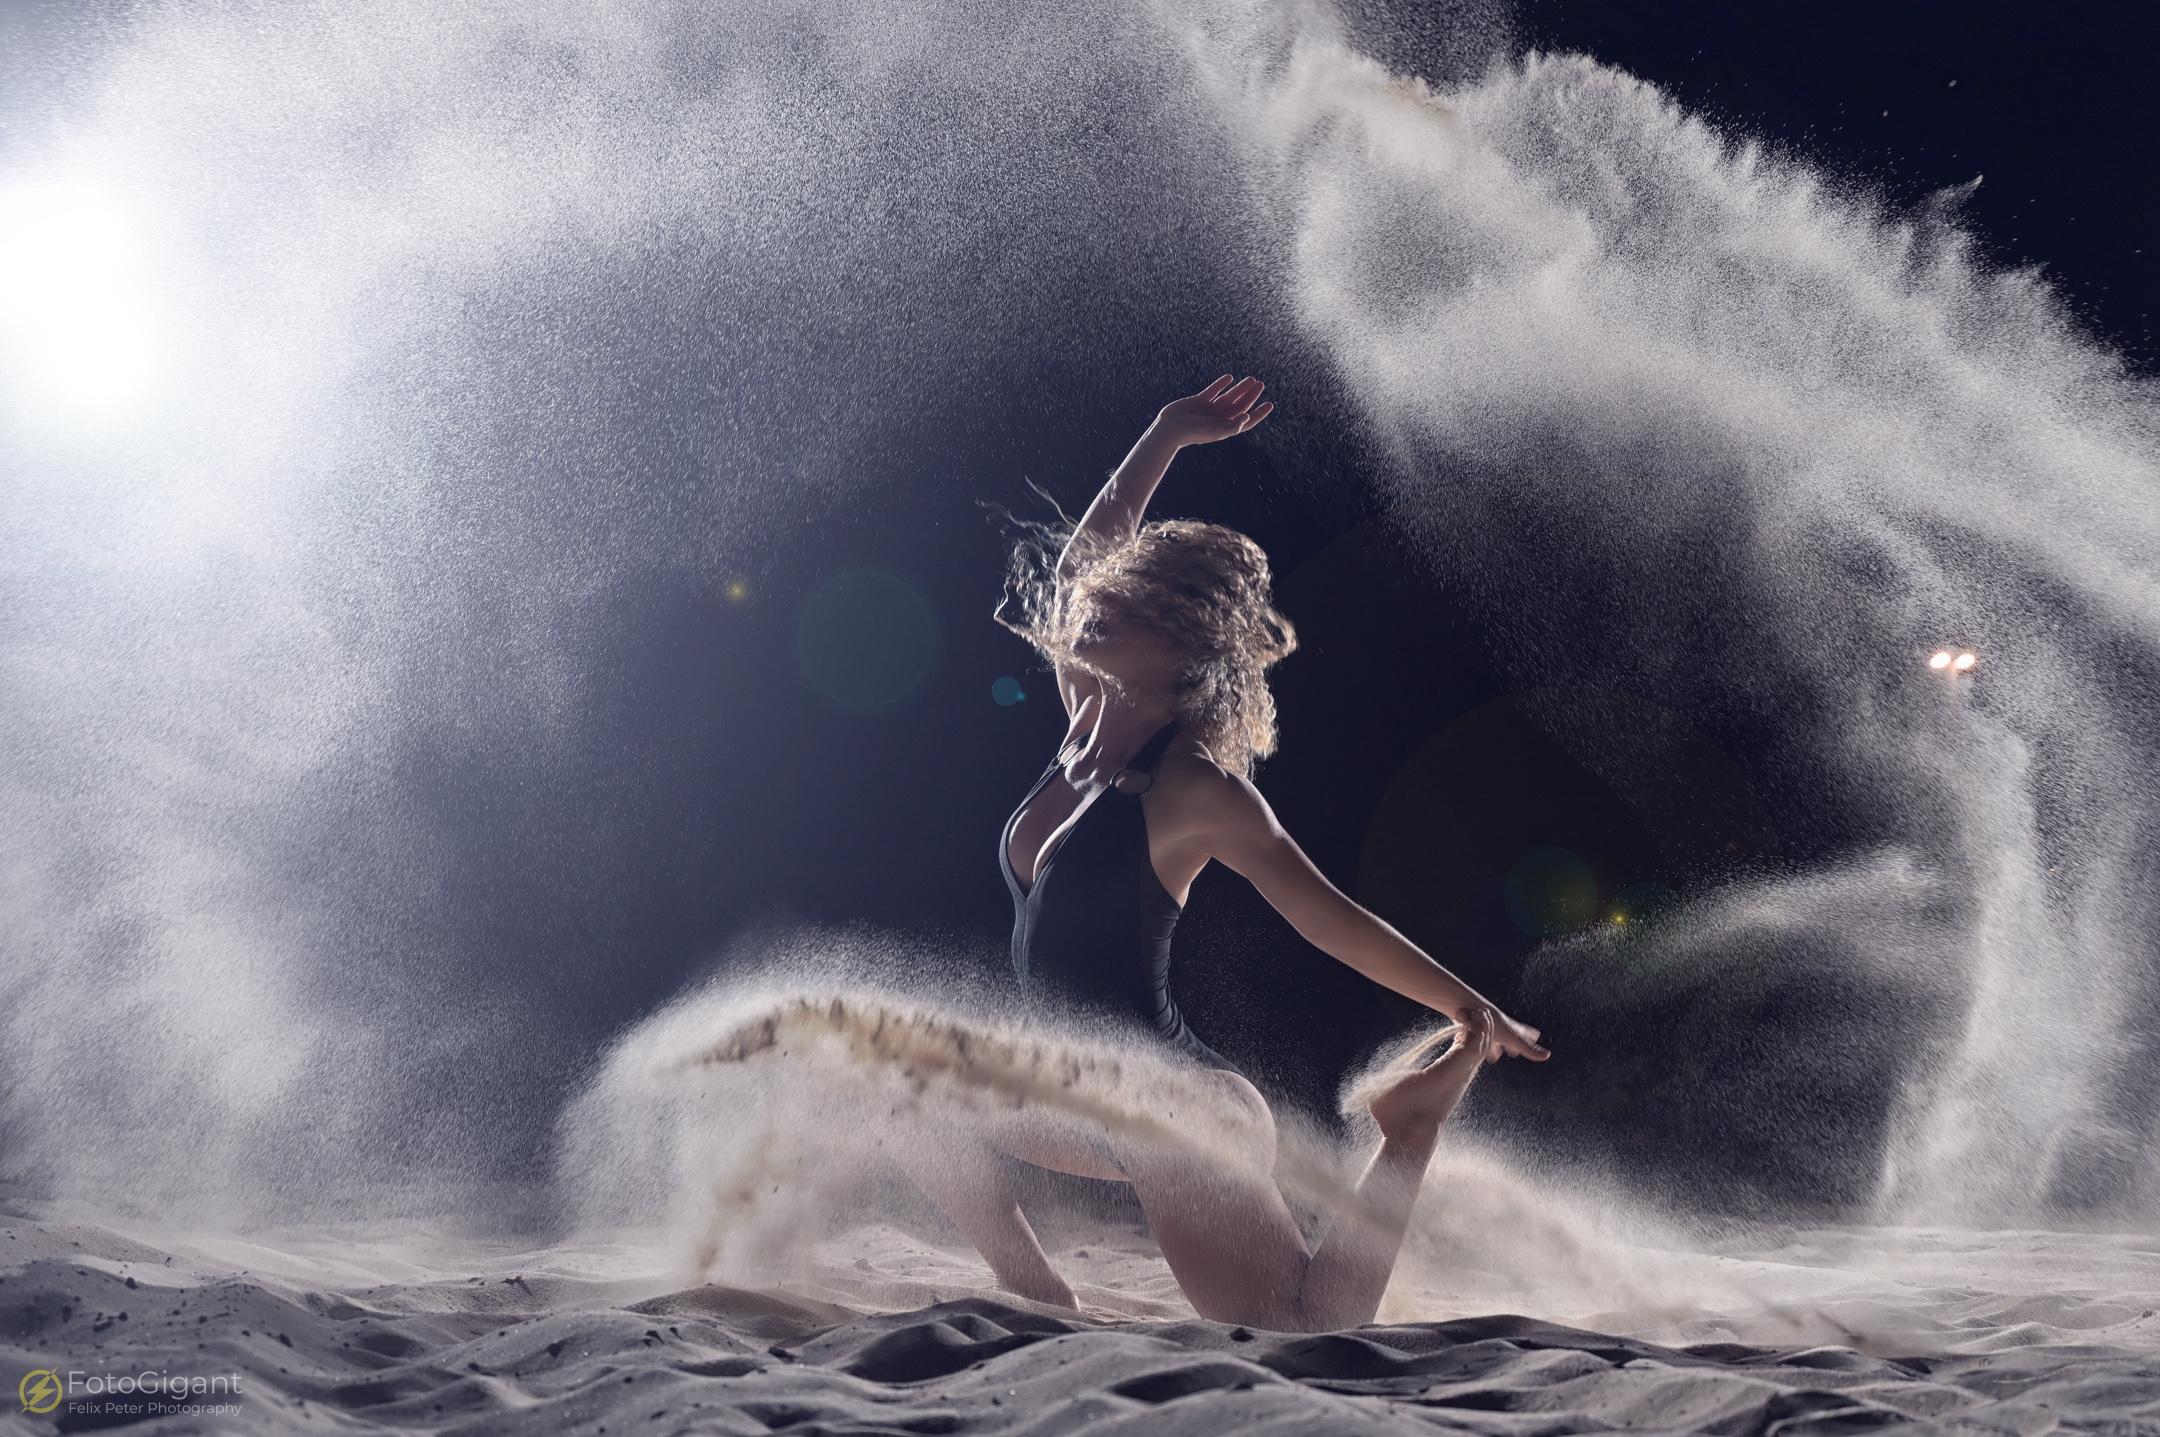 Sand-Flour-Mehl-Shooting_3.jpg